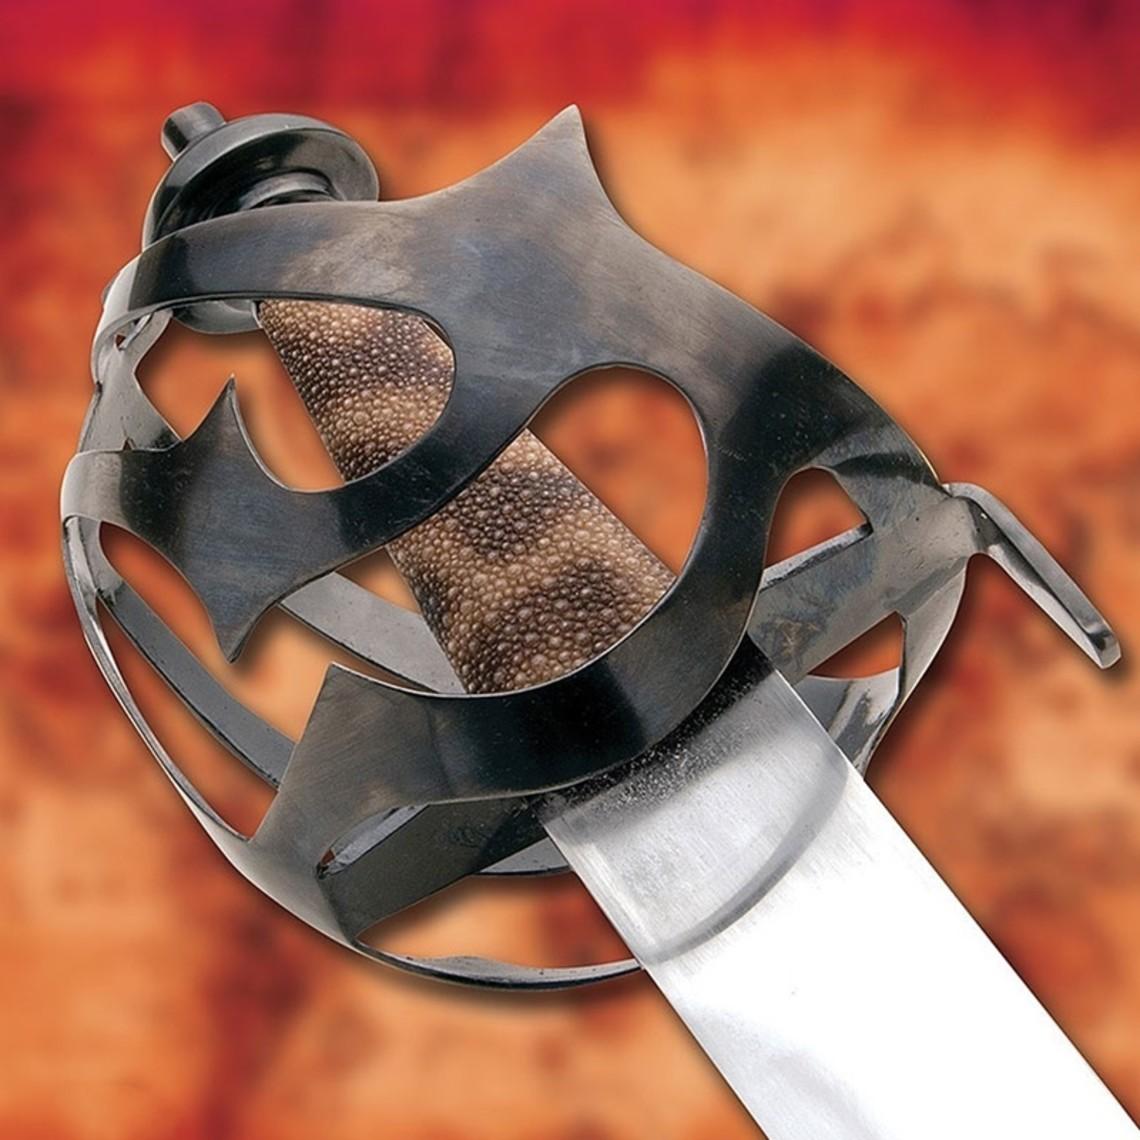 Windlass Steelcrafts Cutlass pirat svärd Davy Jones